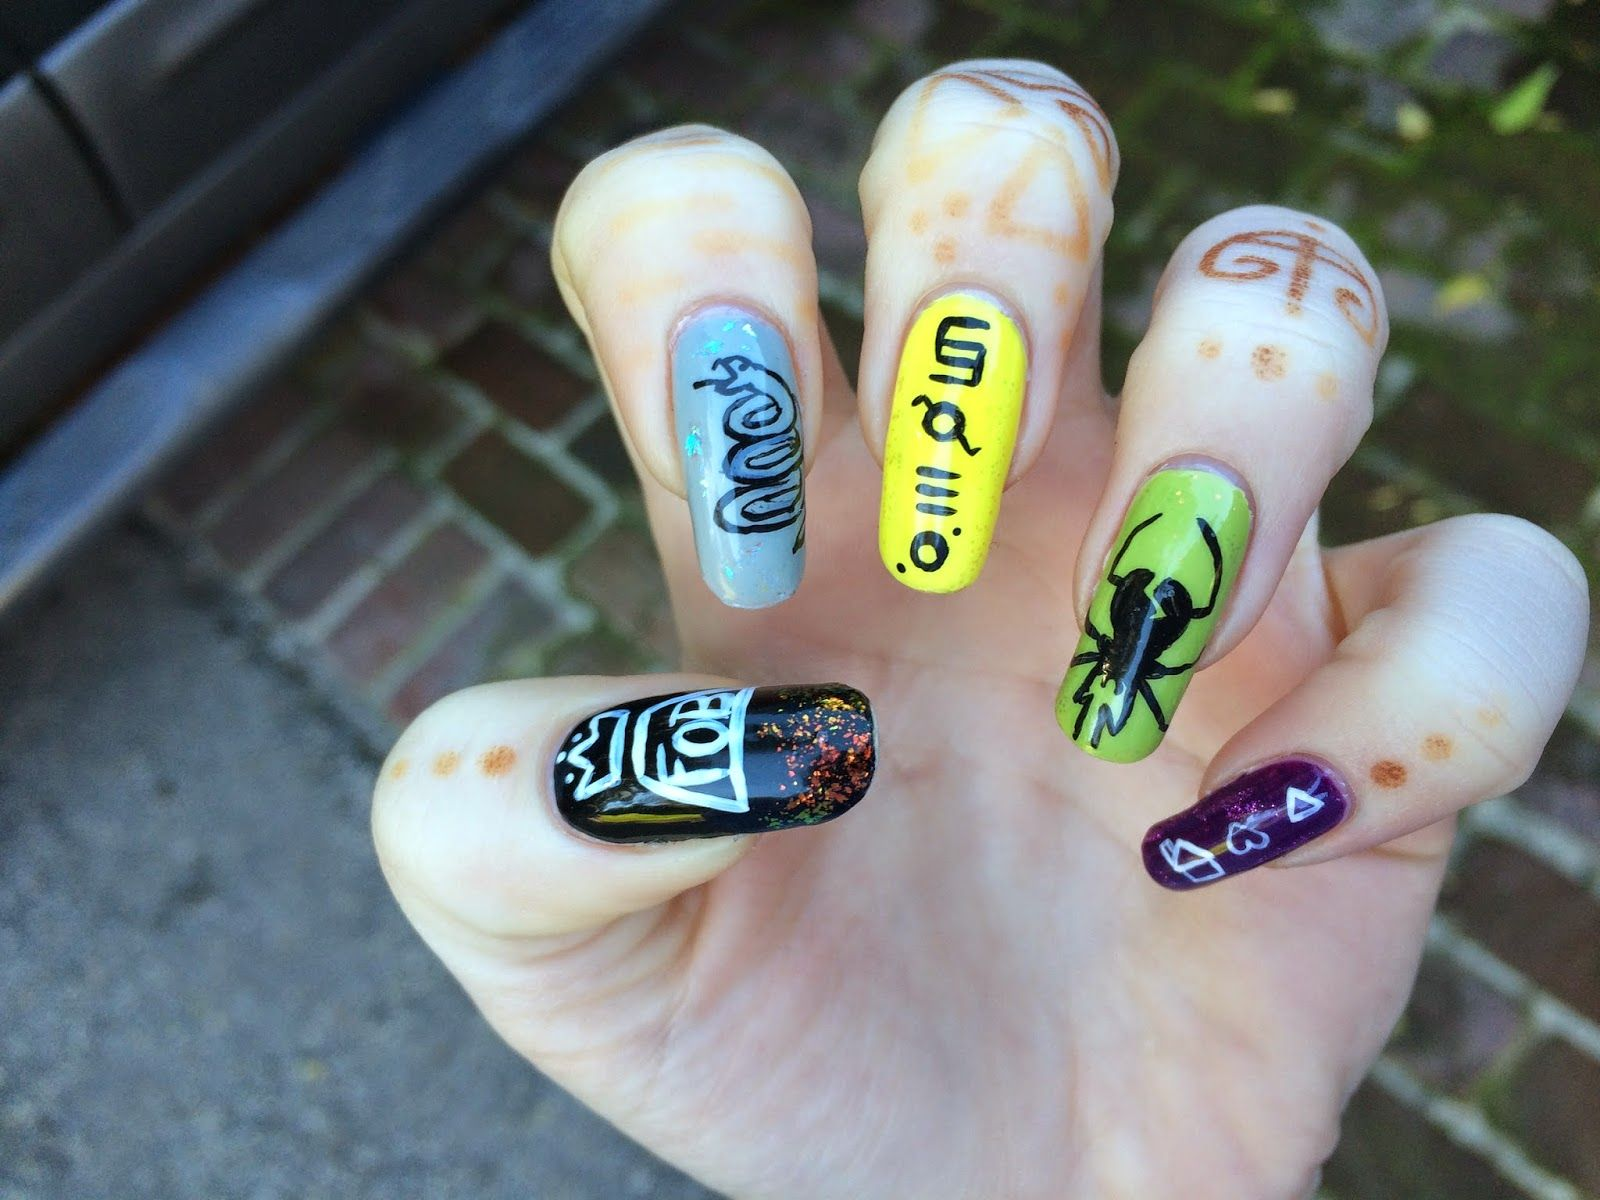 band nail art - Google Search | Nails | Pinterest | Art google